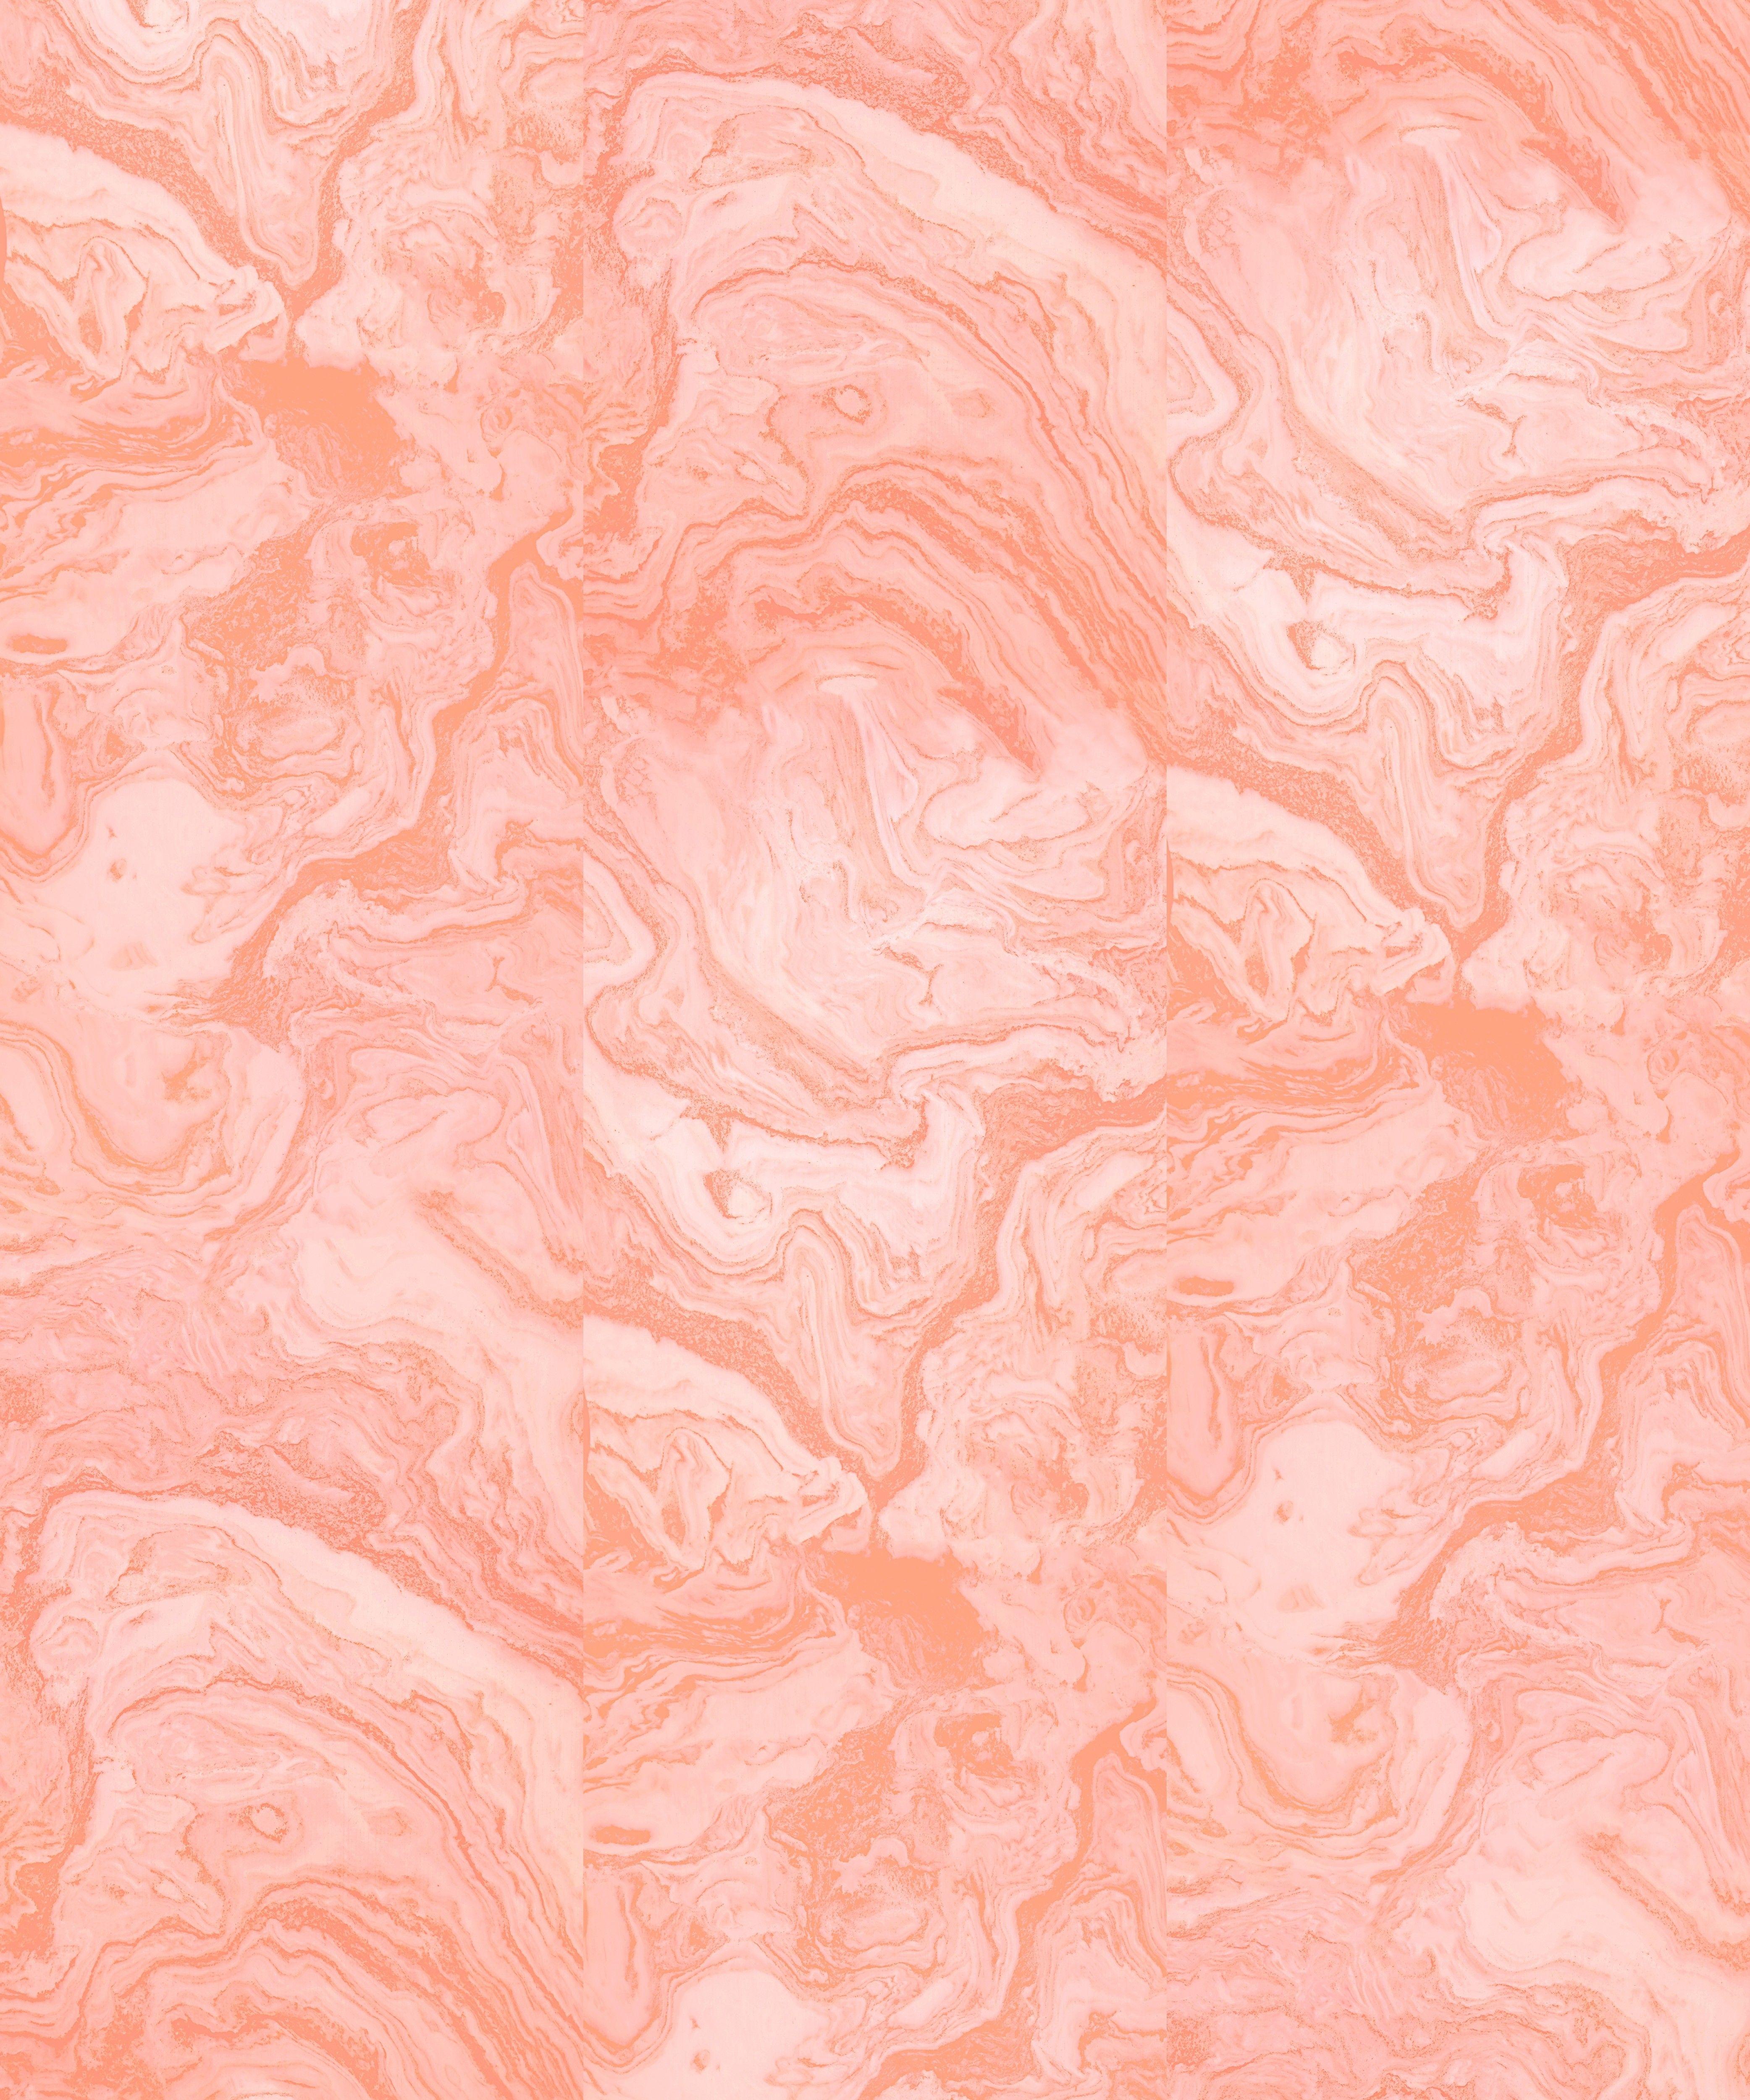 Good Wallpaper Marble Aesthetic - 249cb51b579fda1f58d7d340b80dfb76  Photograph_23387.jpg